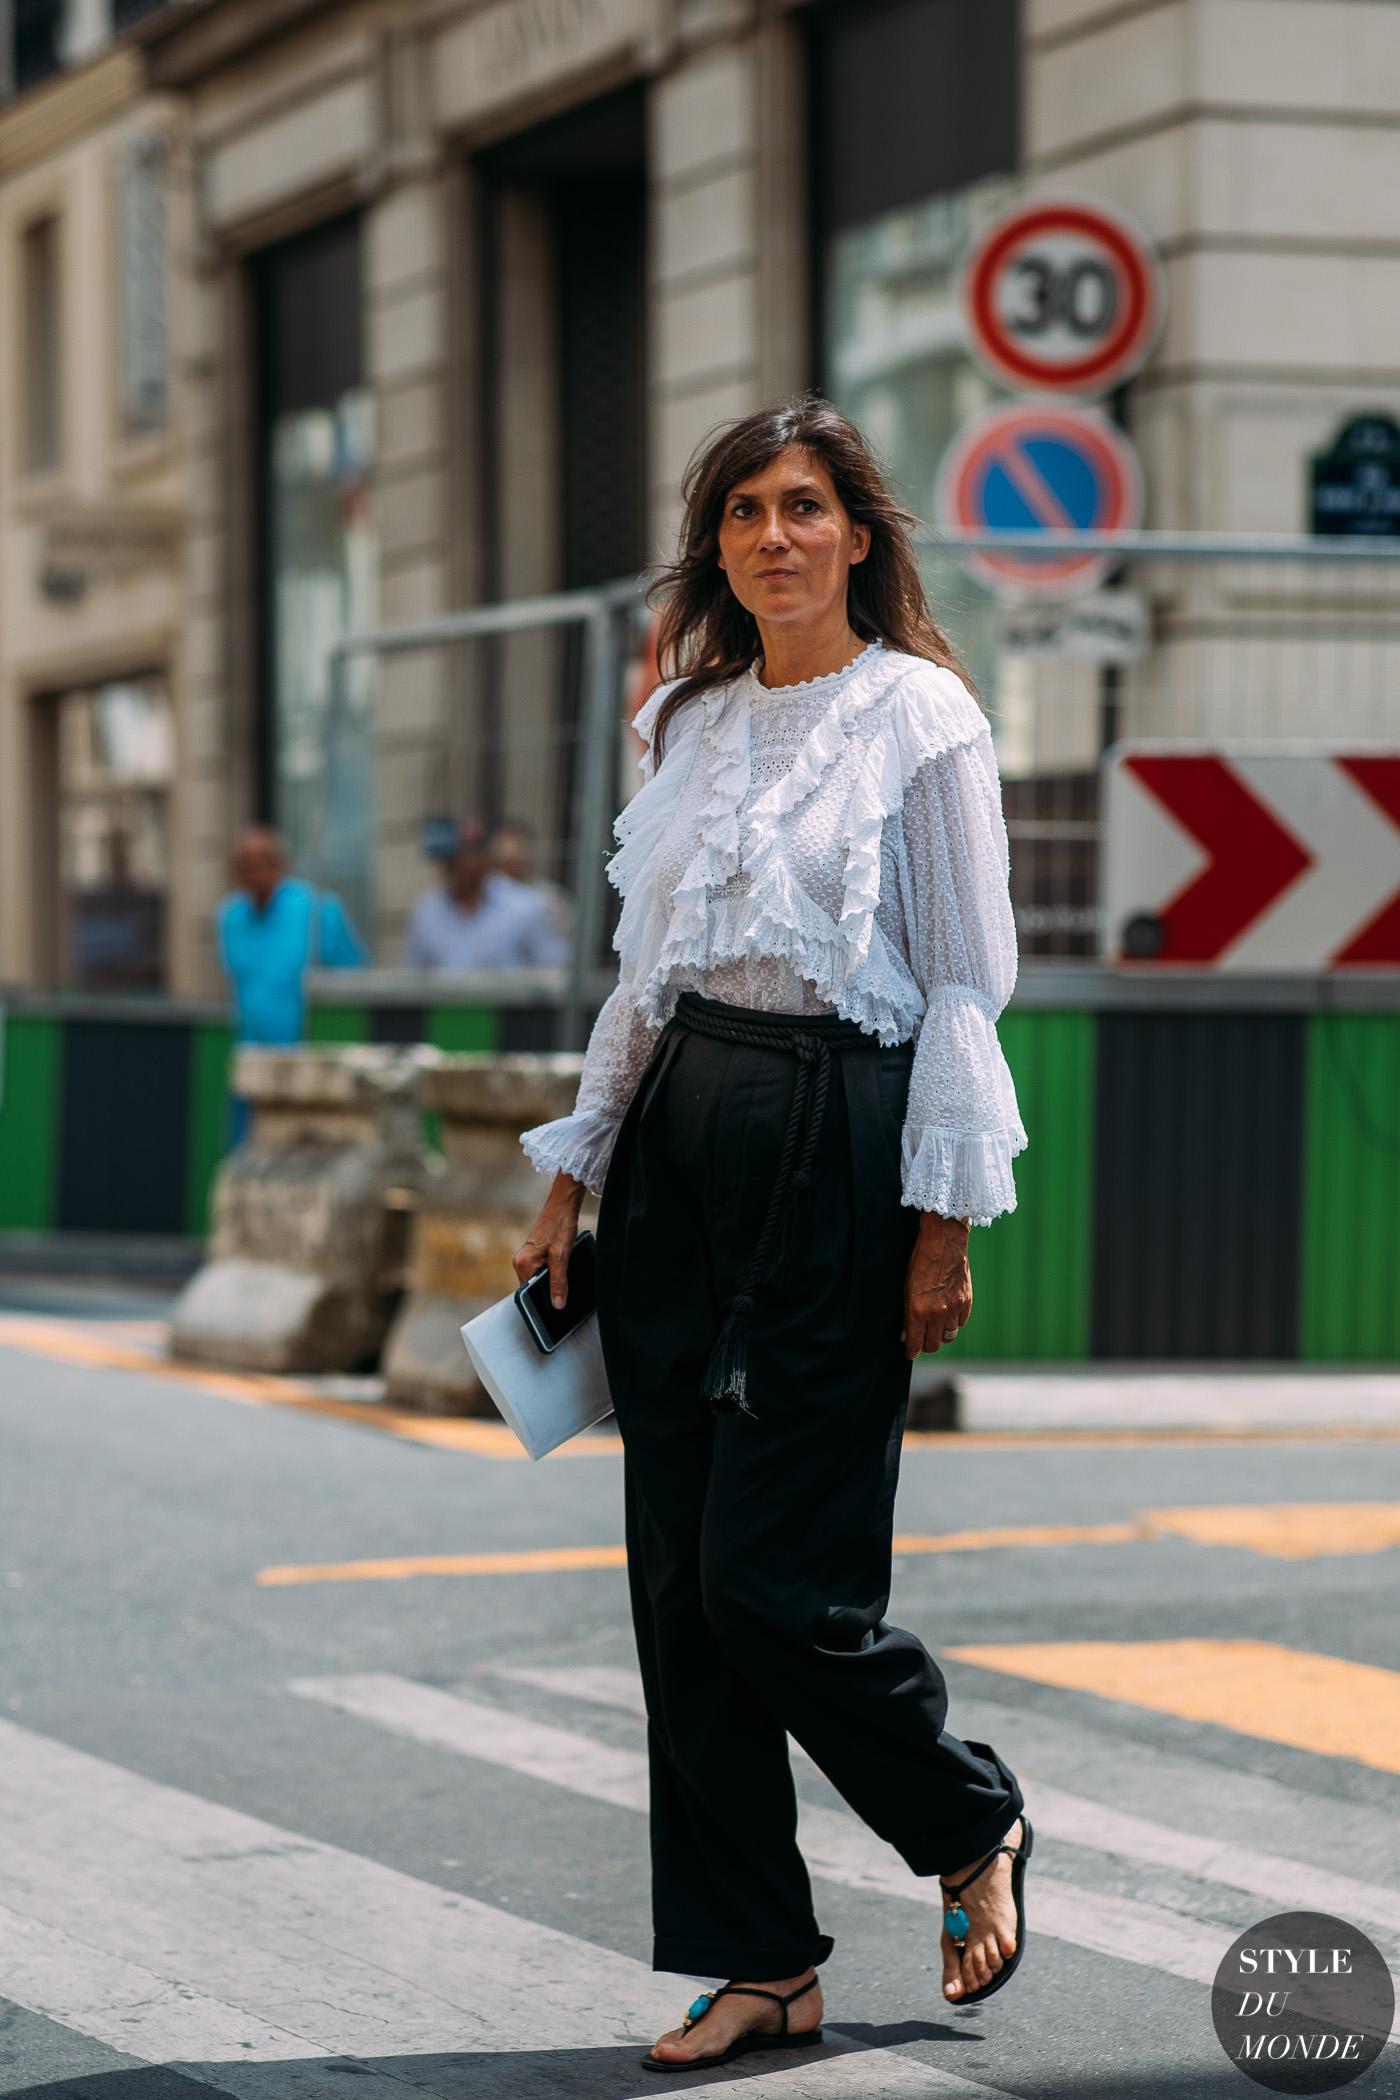 Emmanuelle-Alt-by-STYLEDUMONDE-Street-Style-Fashion-Photography20180701_48A4714.jpg